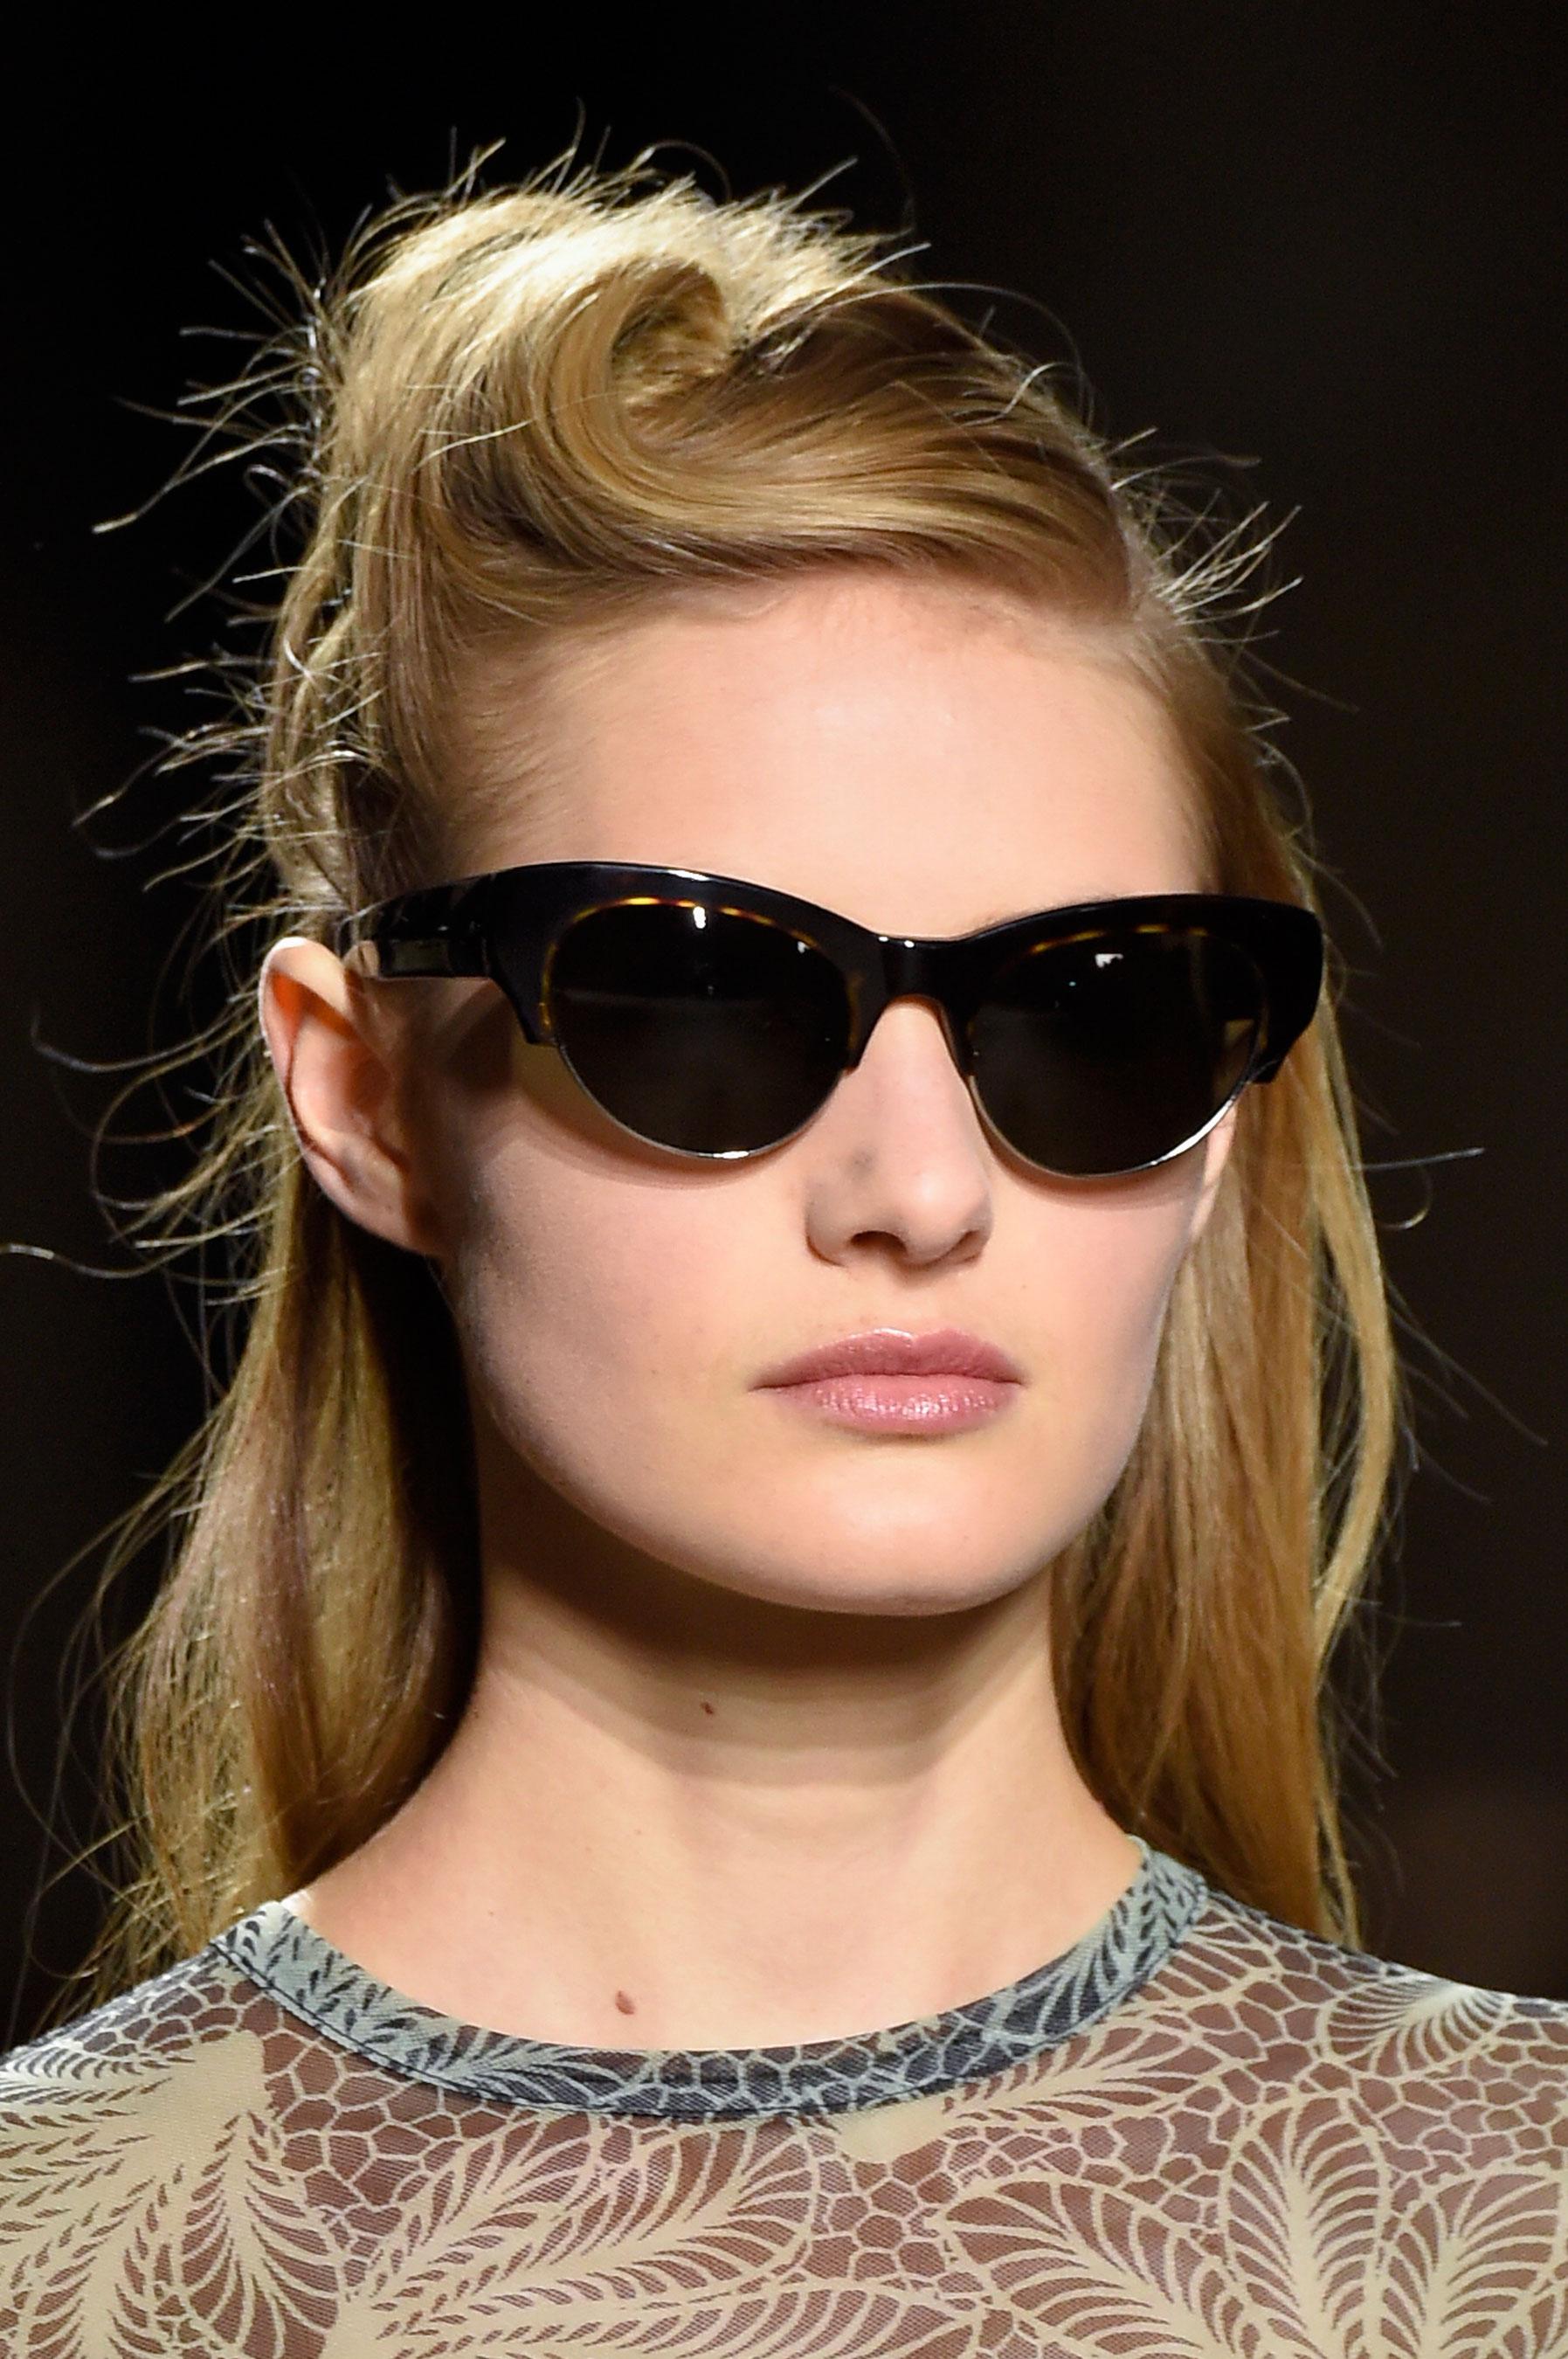 Dries-van-Noten-spring-2016-runway-beauty-fashion-show-the-impression-33